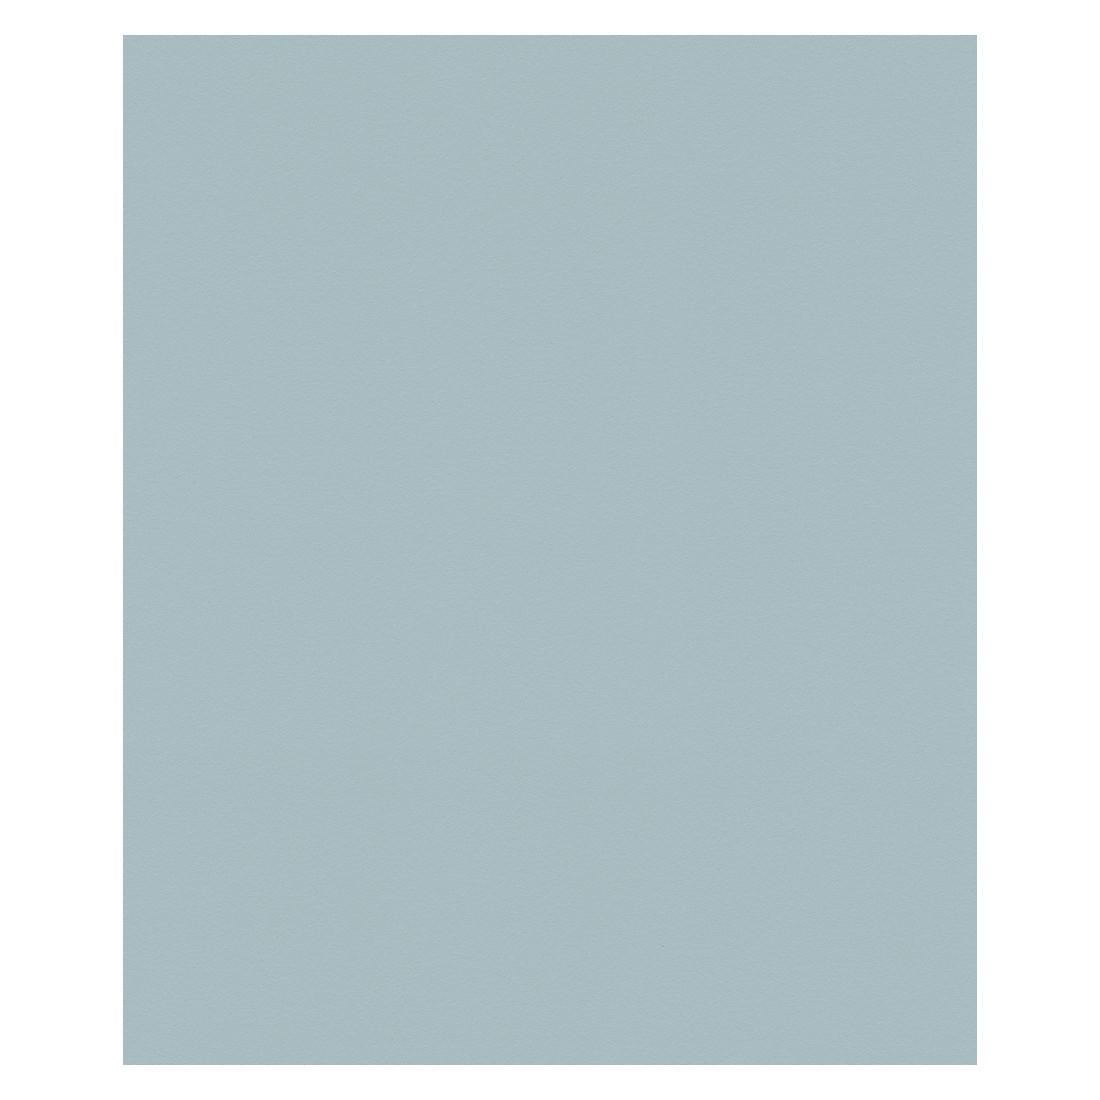 Vliestapete NAF-NAF – grün, metallic – glatt, Home24Deko online kaufen